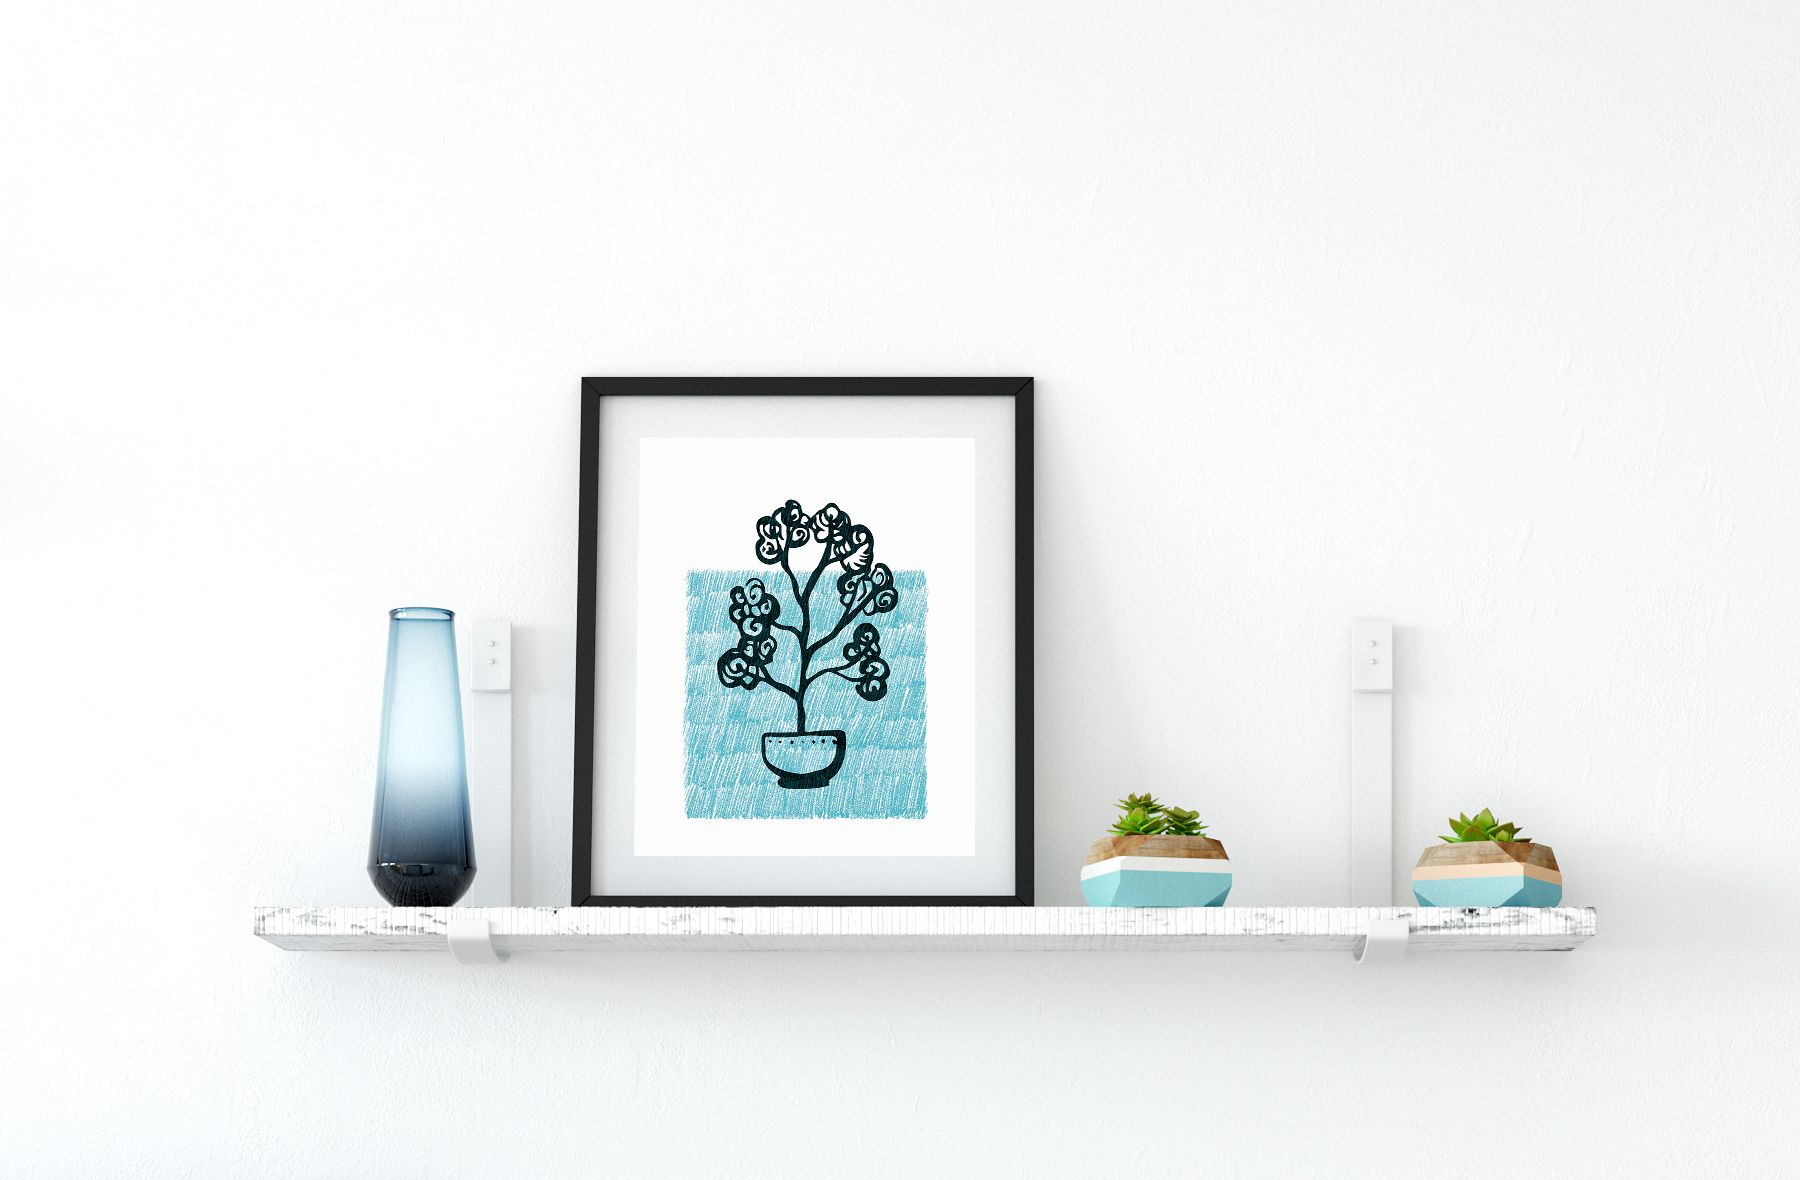 ART PRINT GERANIUM STAMP Comanda postere de pe www.zizula.ro  #wallart #lovepaper #walldecor #mycosyhome #interiorlove #artforthehome #digitalartdesign #interiorforall #wallartdecor